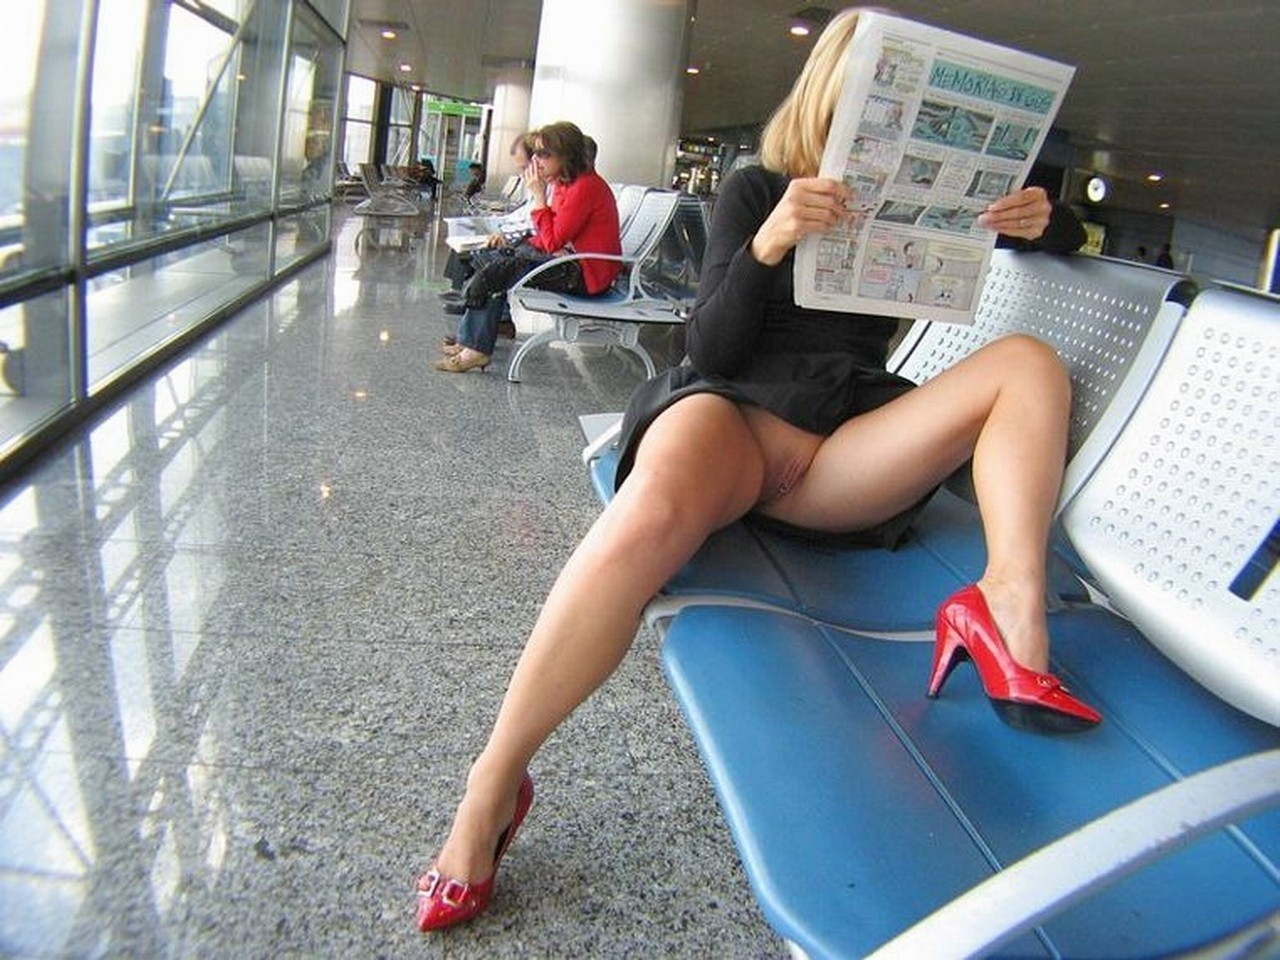 транспорте на порно улеце и в светы за